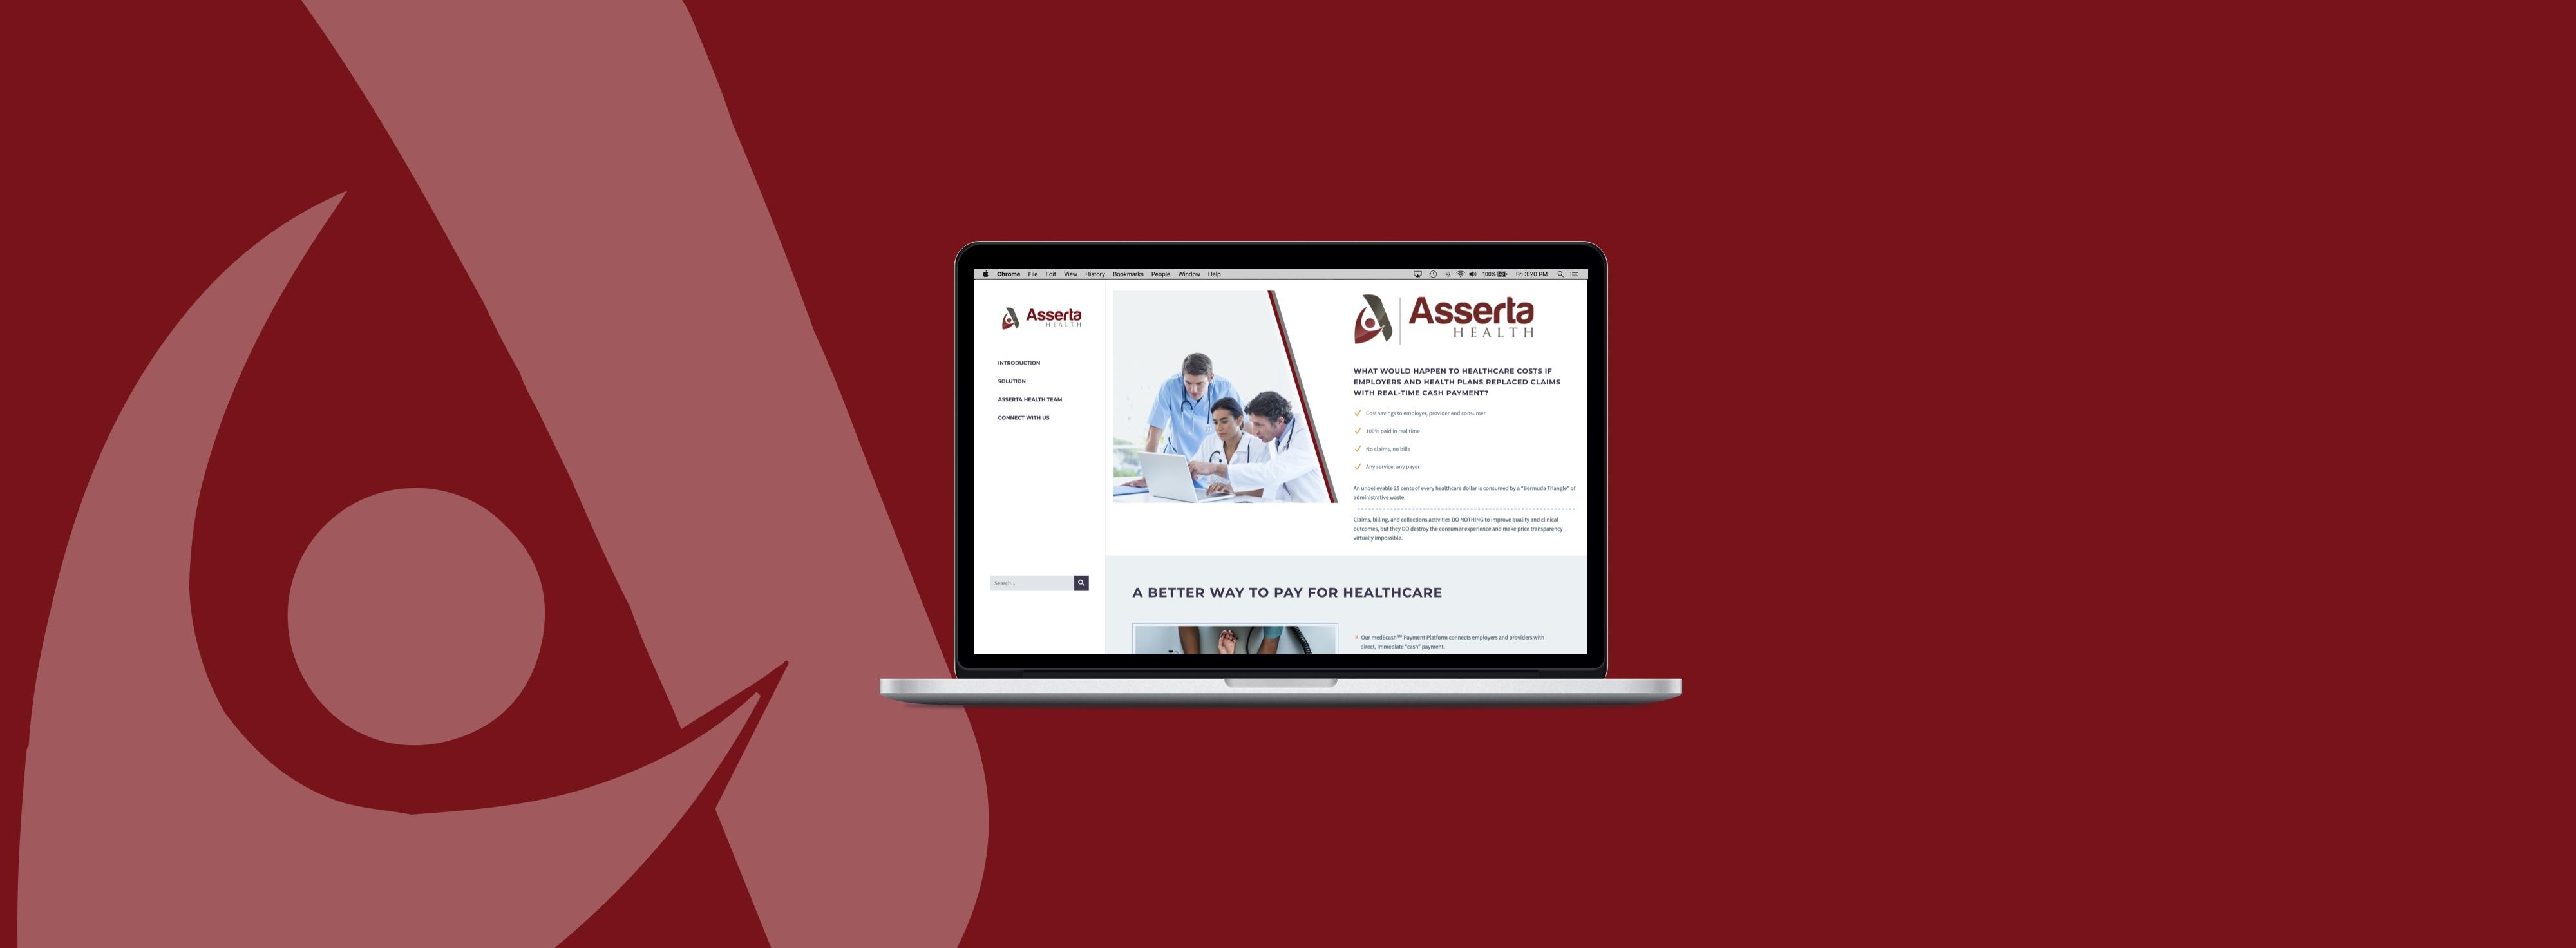 asserta health featured image